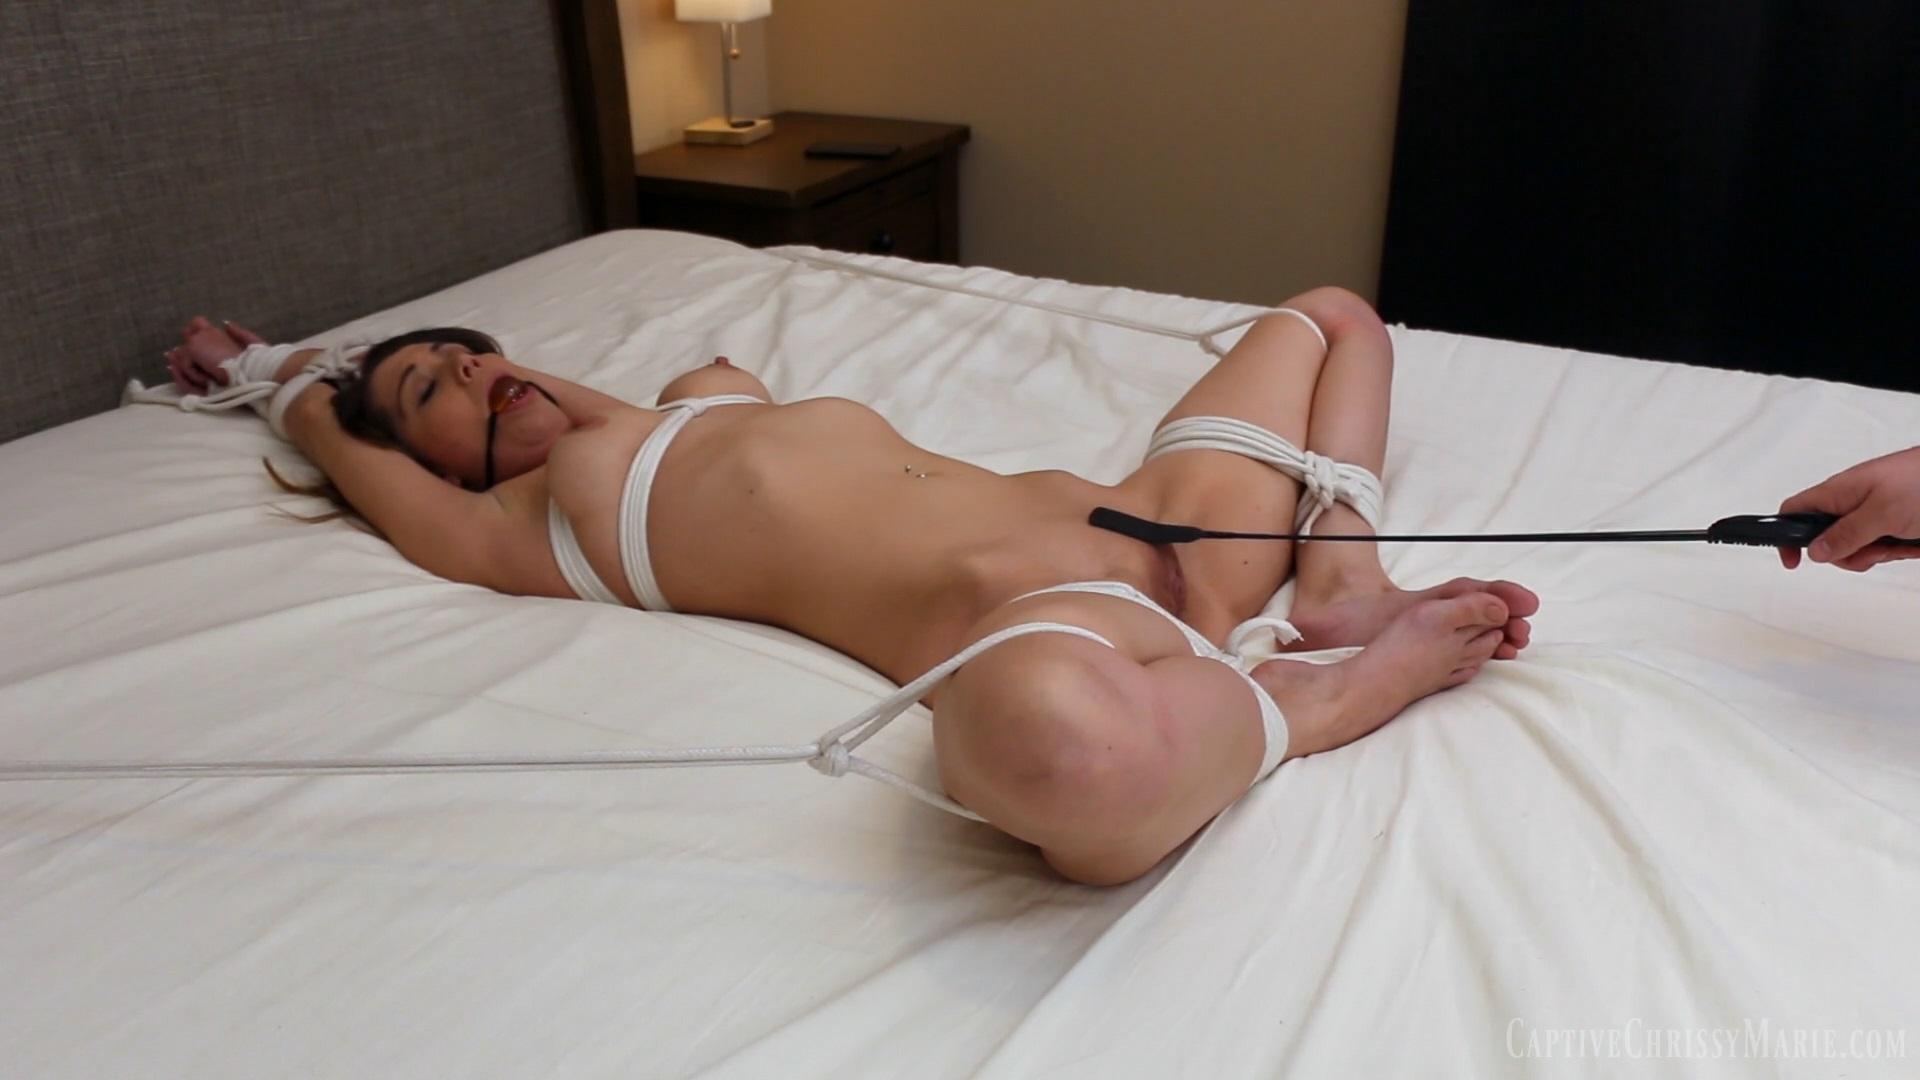 Slavegirl Bound Spread to the Bed 2